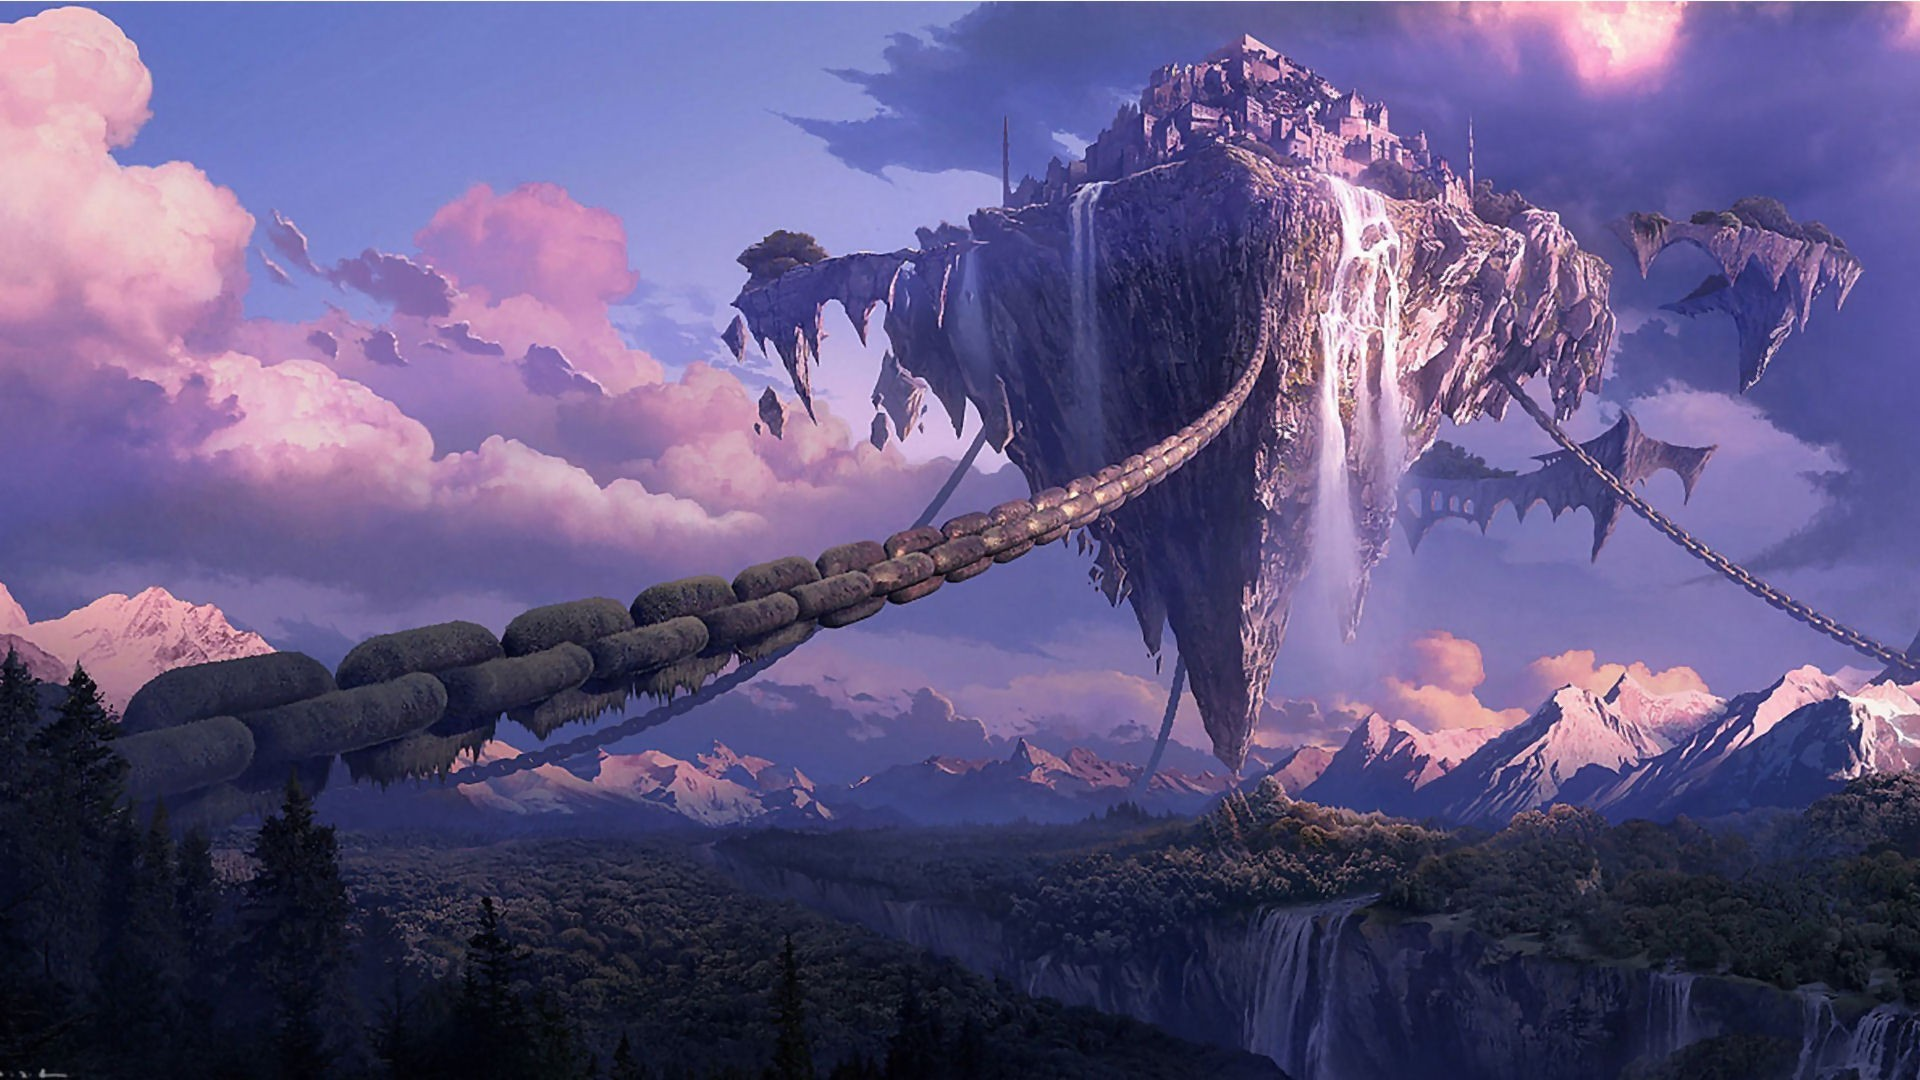 X Anime Fantasy Landscape Wallpaper Images